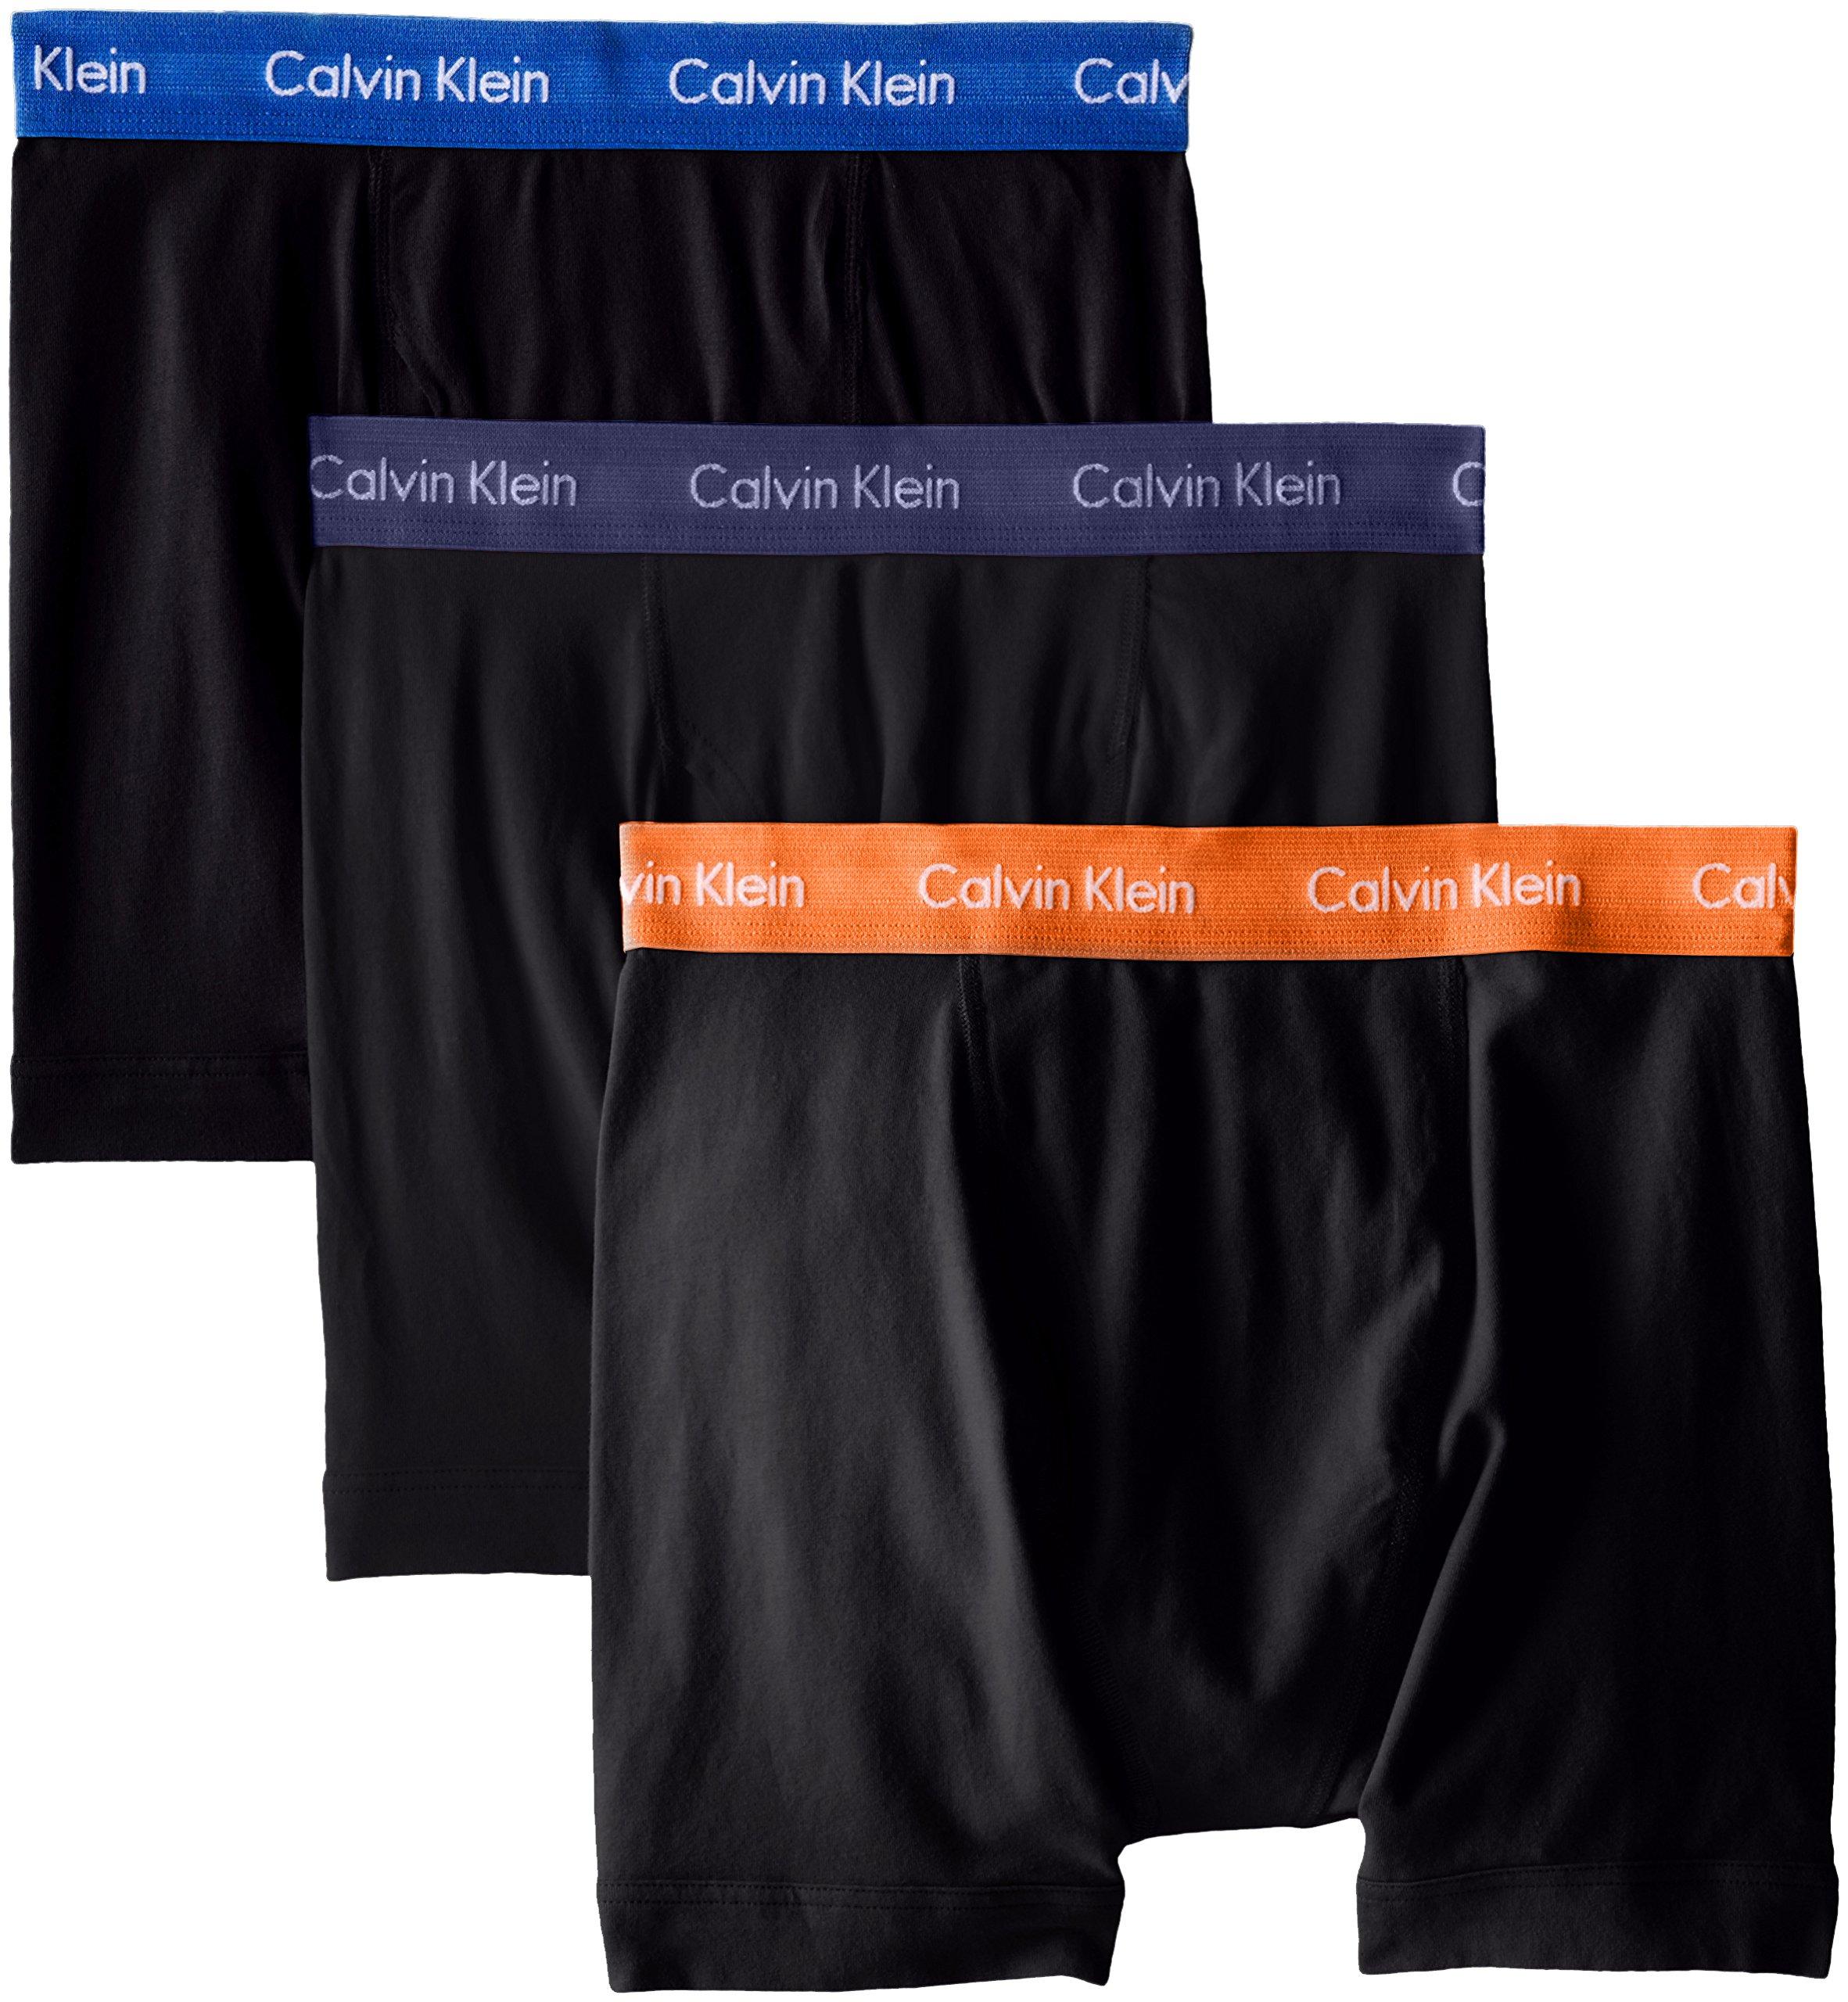 Calvin Klein Men's Underwear Cotton Stretch 3 Pack Boxer Briefs, Black/Muscari Blue/Blue Ribbon/Deep Sunset, Medium